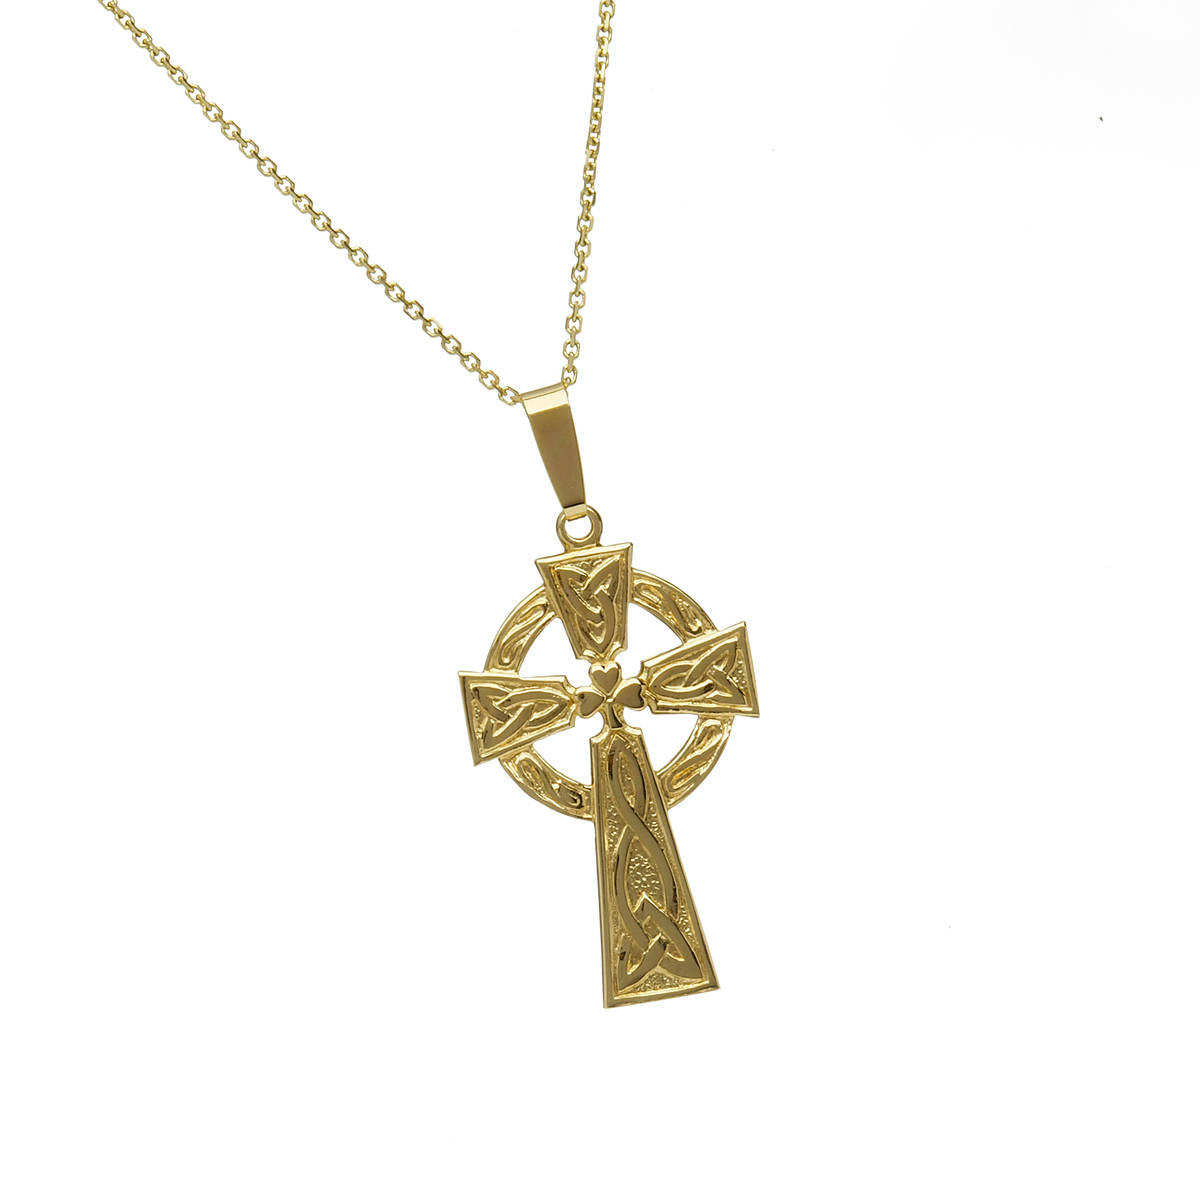 10 carat yellow gold Shamrock celtic cross pendant.